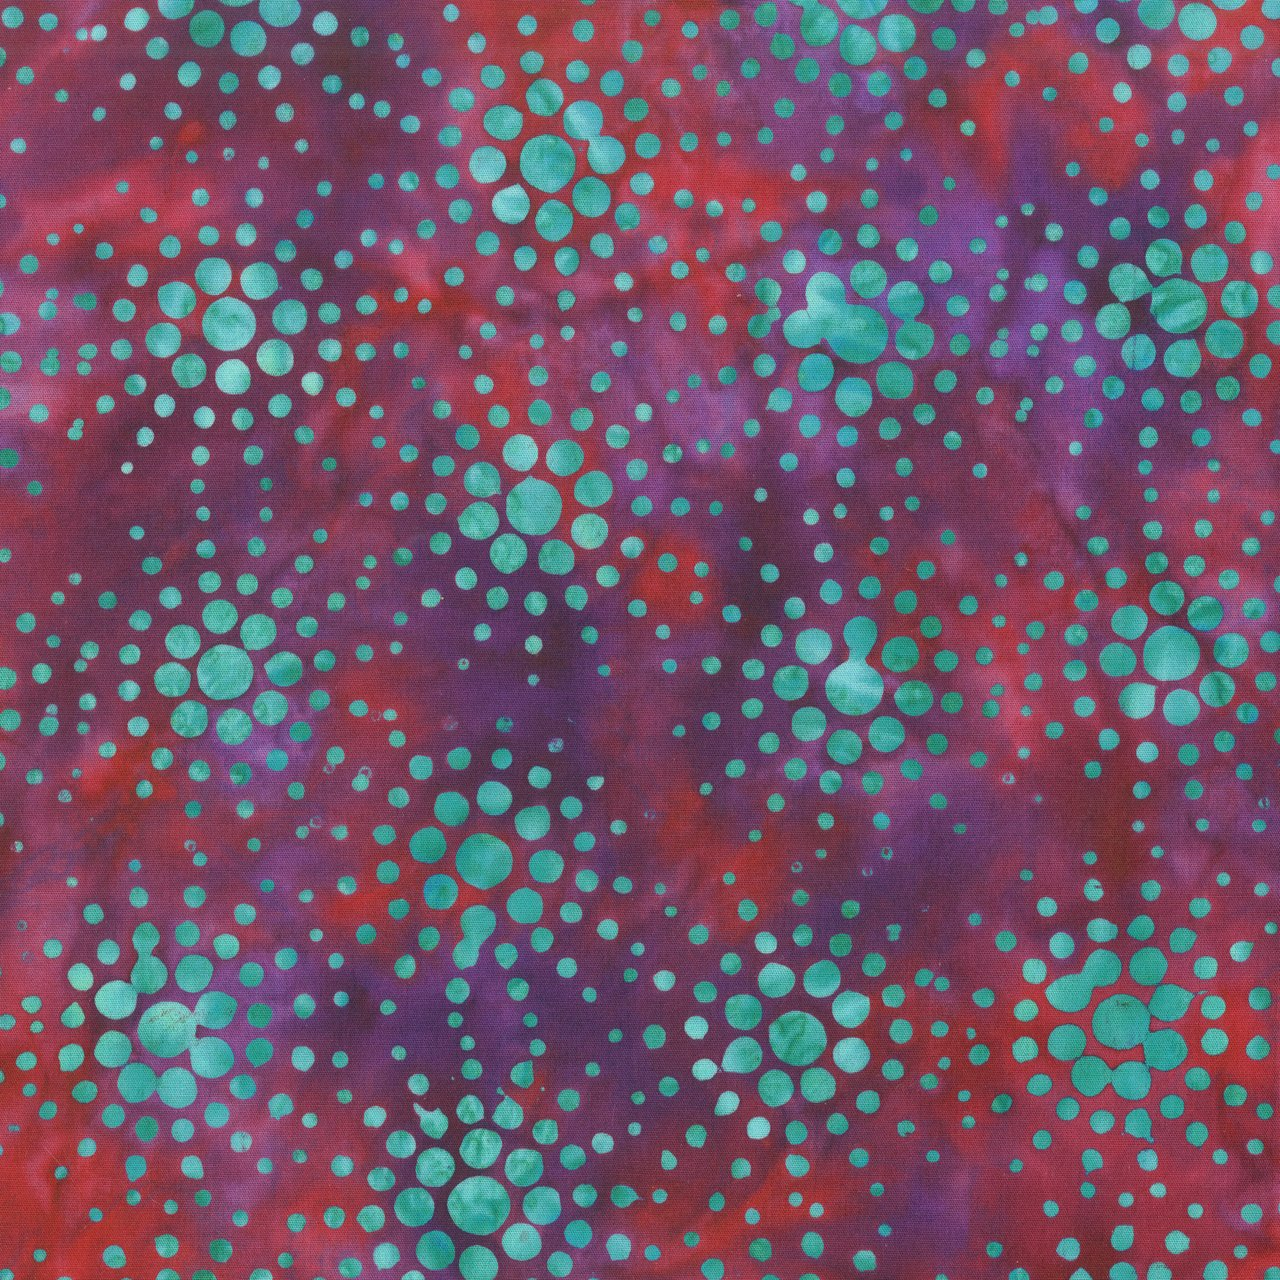 Raspberry Essence batik 344Q-5 Jacqueline de Jonge